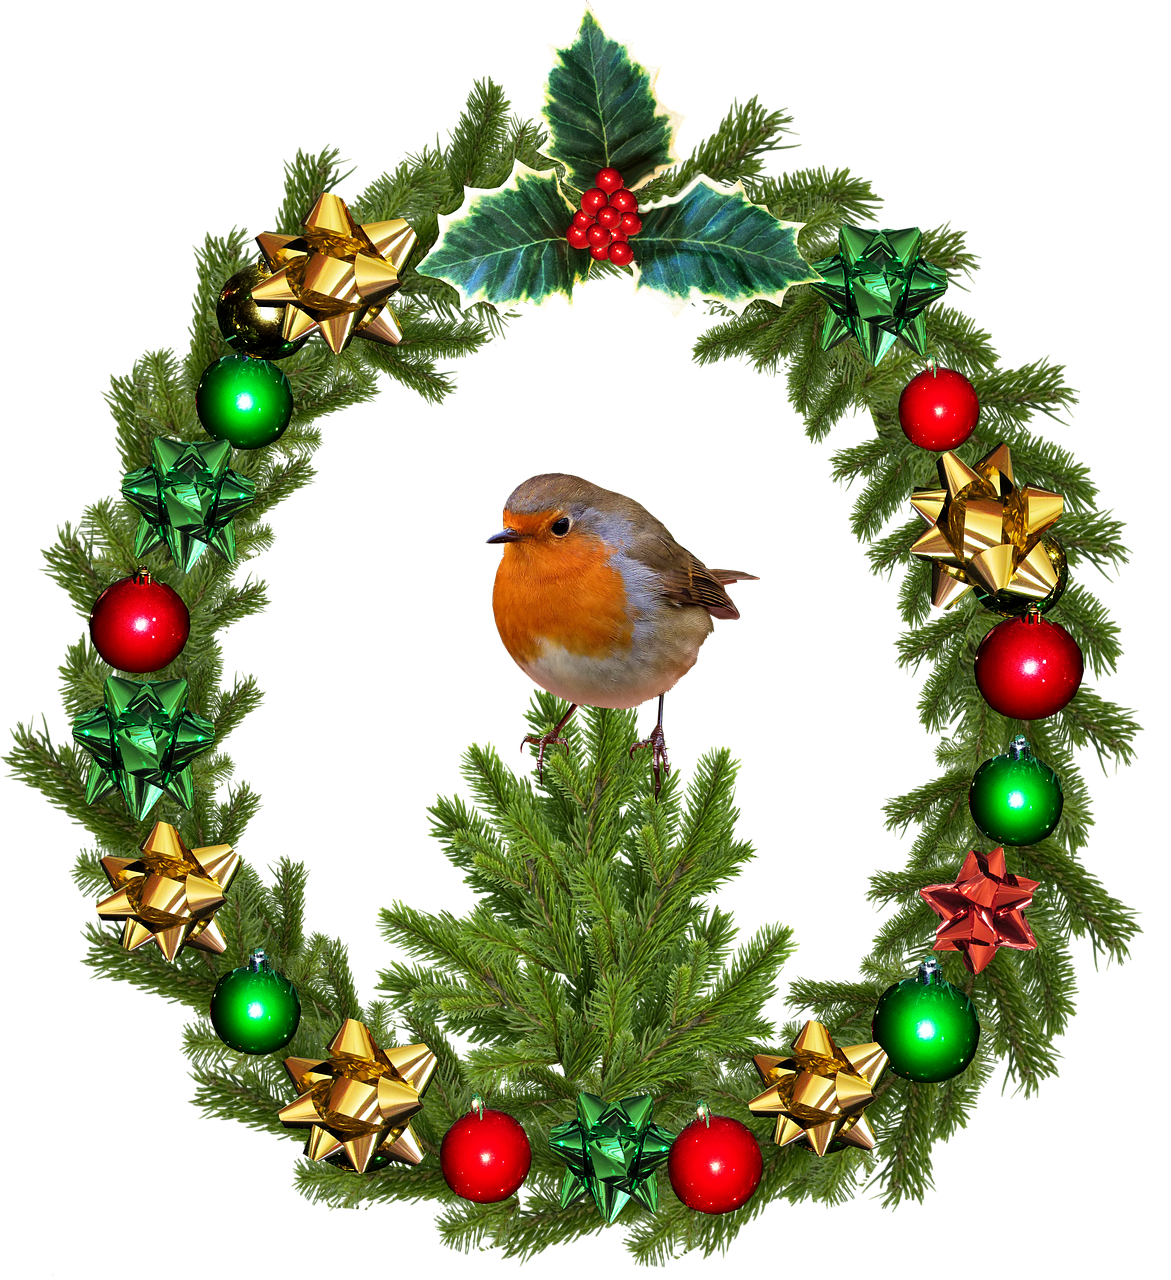 Joulun lintuja: punarinta ja punatulkku